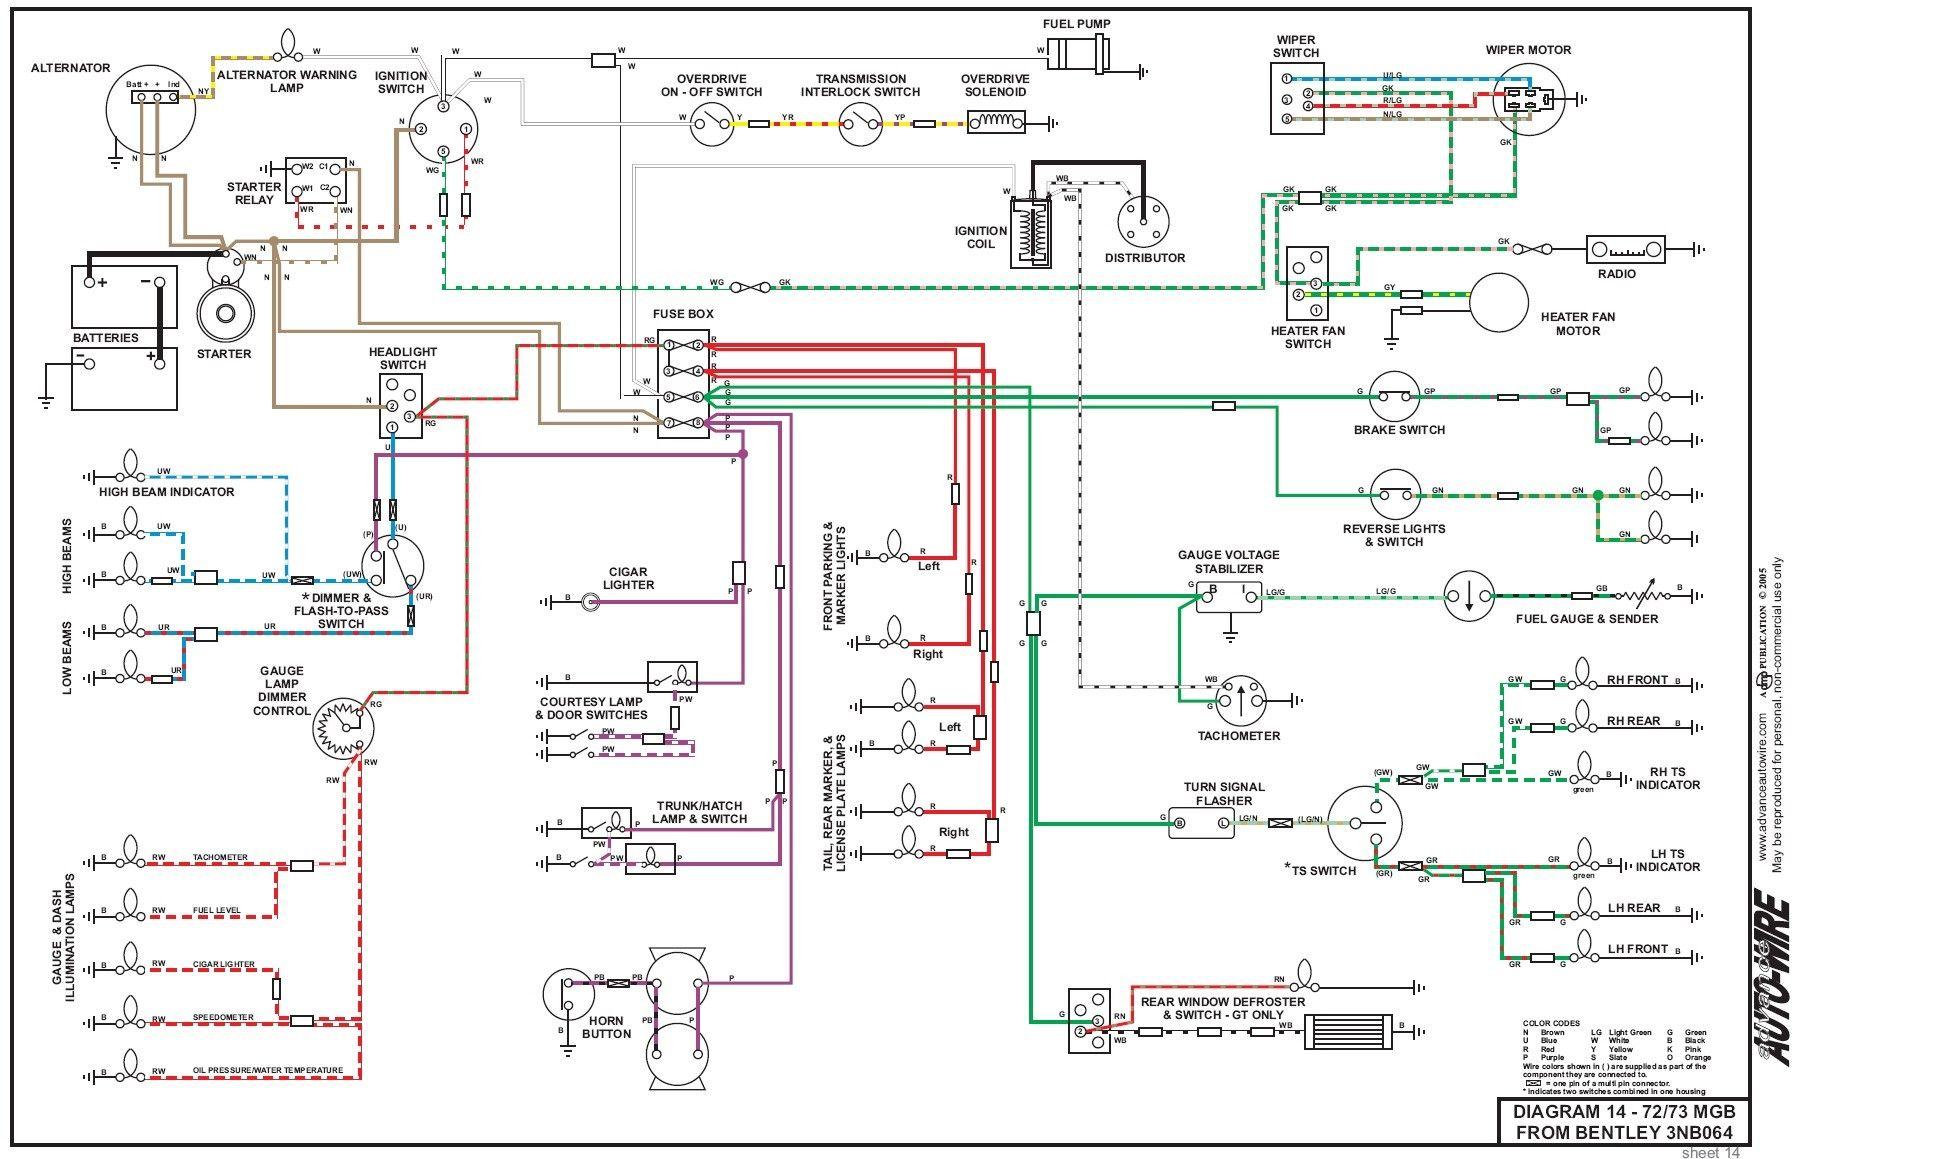 Wiring Diagram For Auto Gate Diagram Diagramtemplate Diagramsample Check More At Https Servisi Co Wiring Diagram For Auto Gate